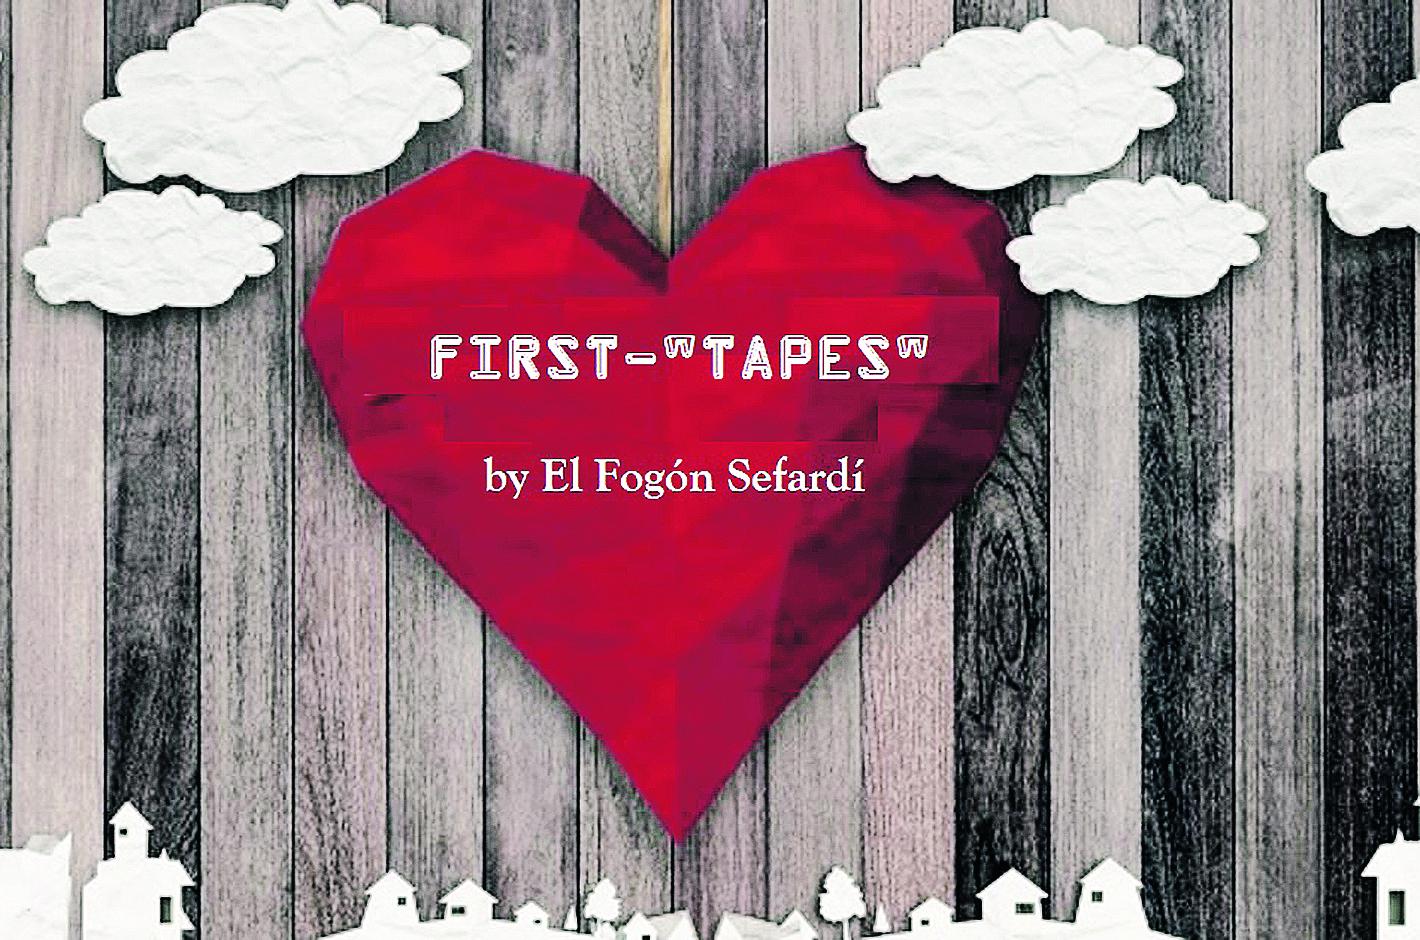 EL FOGON SEFARDI FIRST TAPES